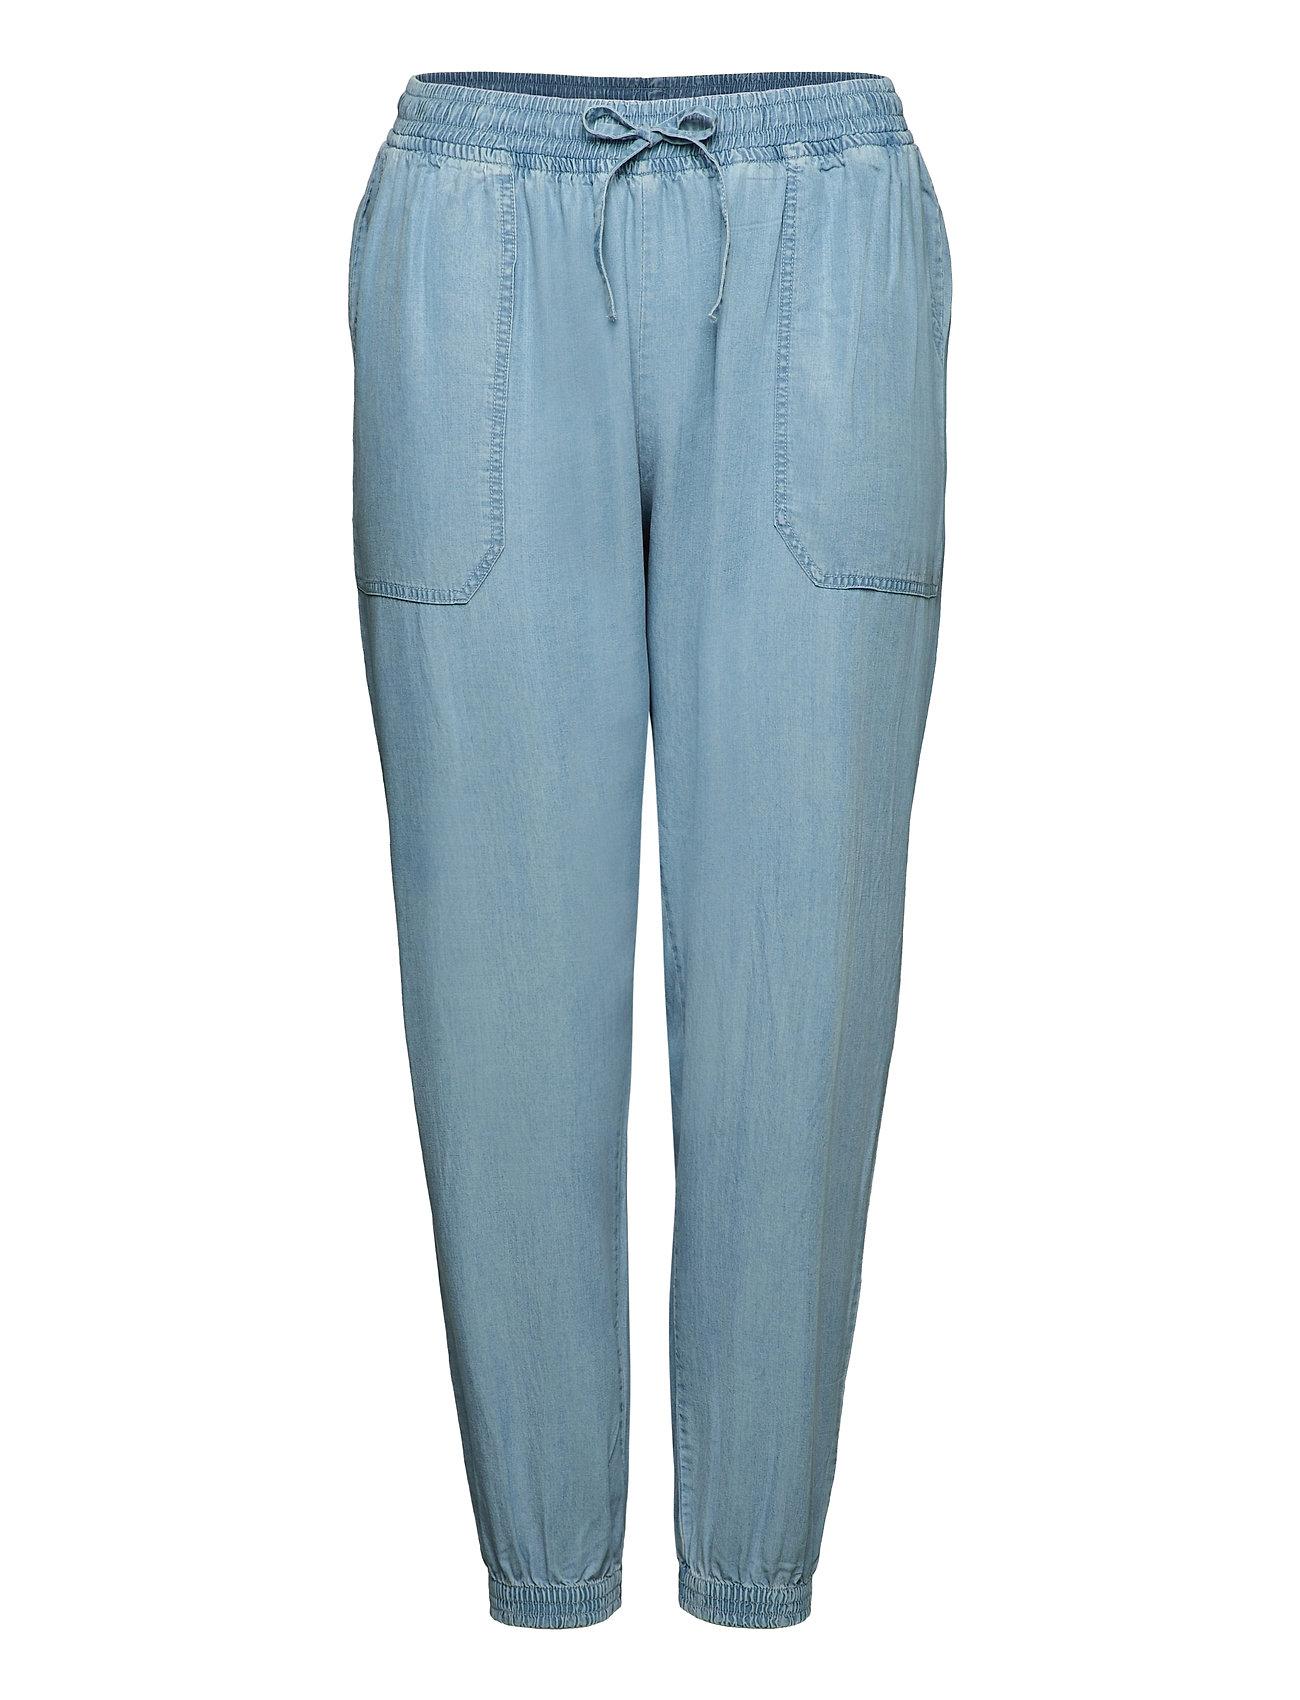 Trousers Loose Fit Plus Adjustable Drawstring Casual Bukser Blå Zizzi